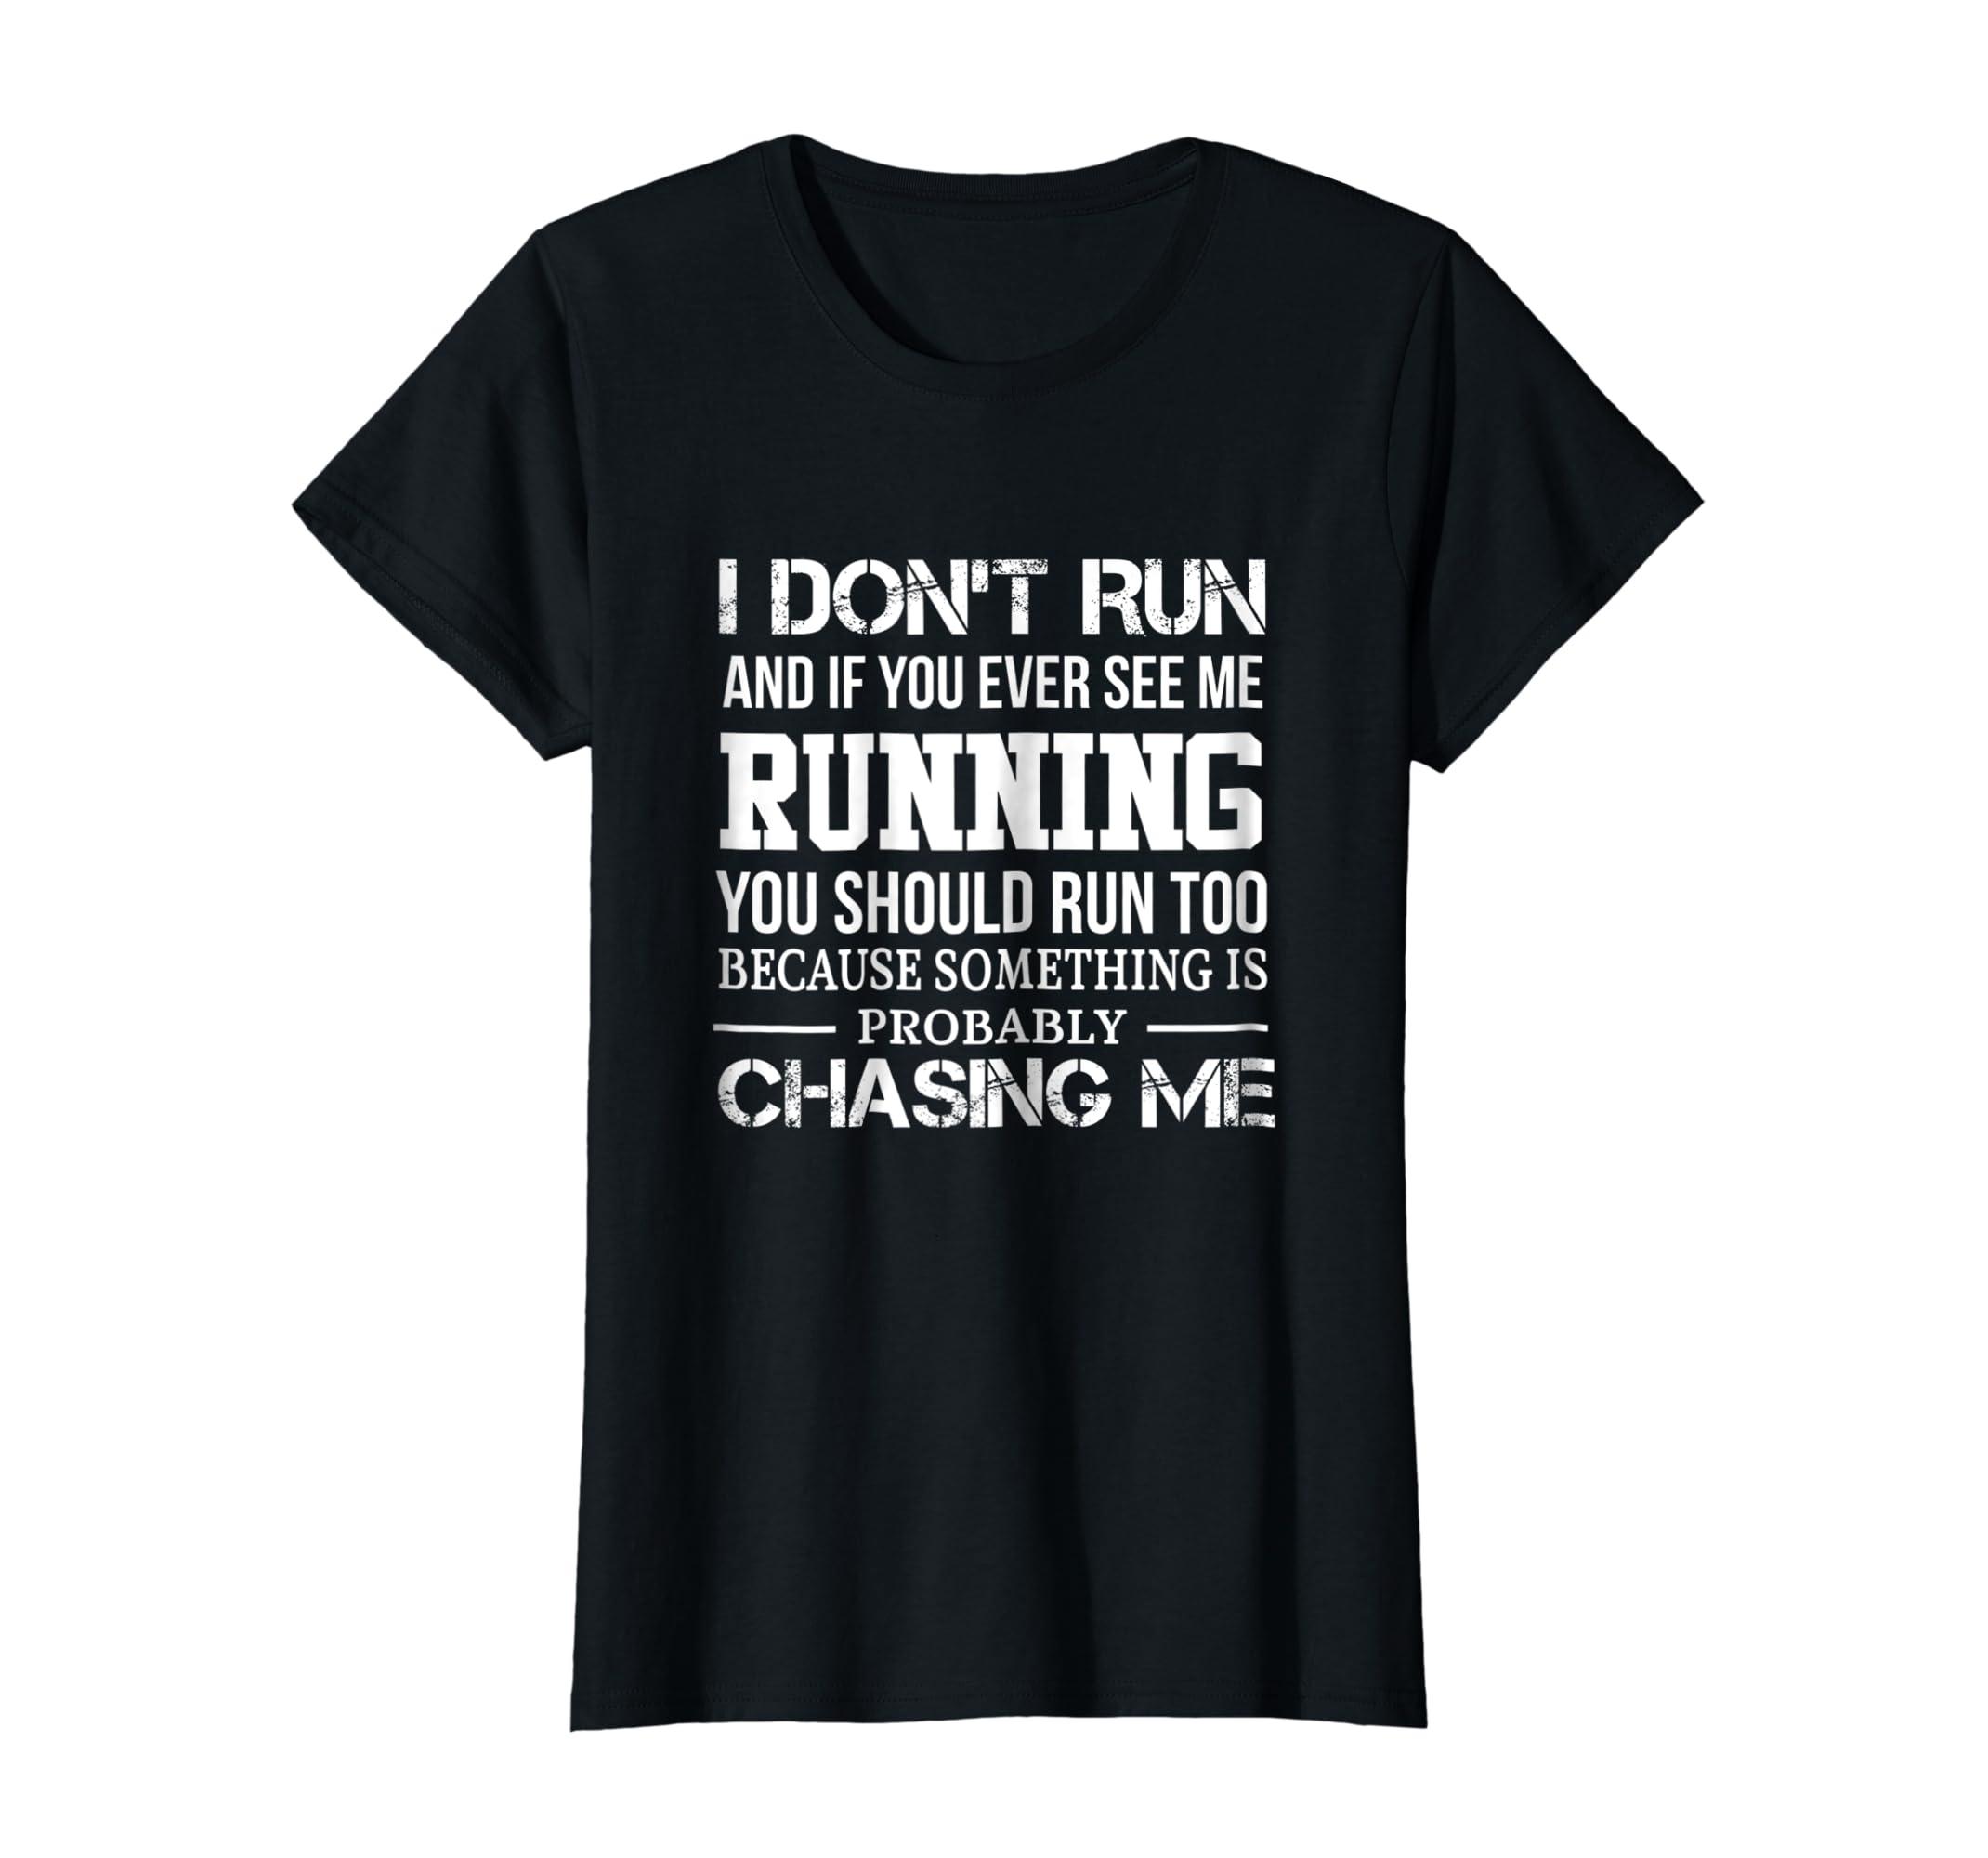 044f5e3b5 Amazon.com: I Don't Run And If You Ever See Me Running T Shirts Funny:  Clothing